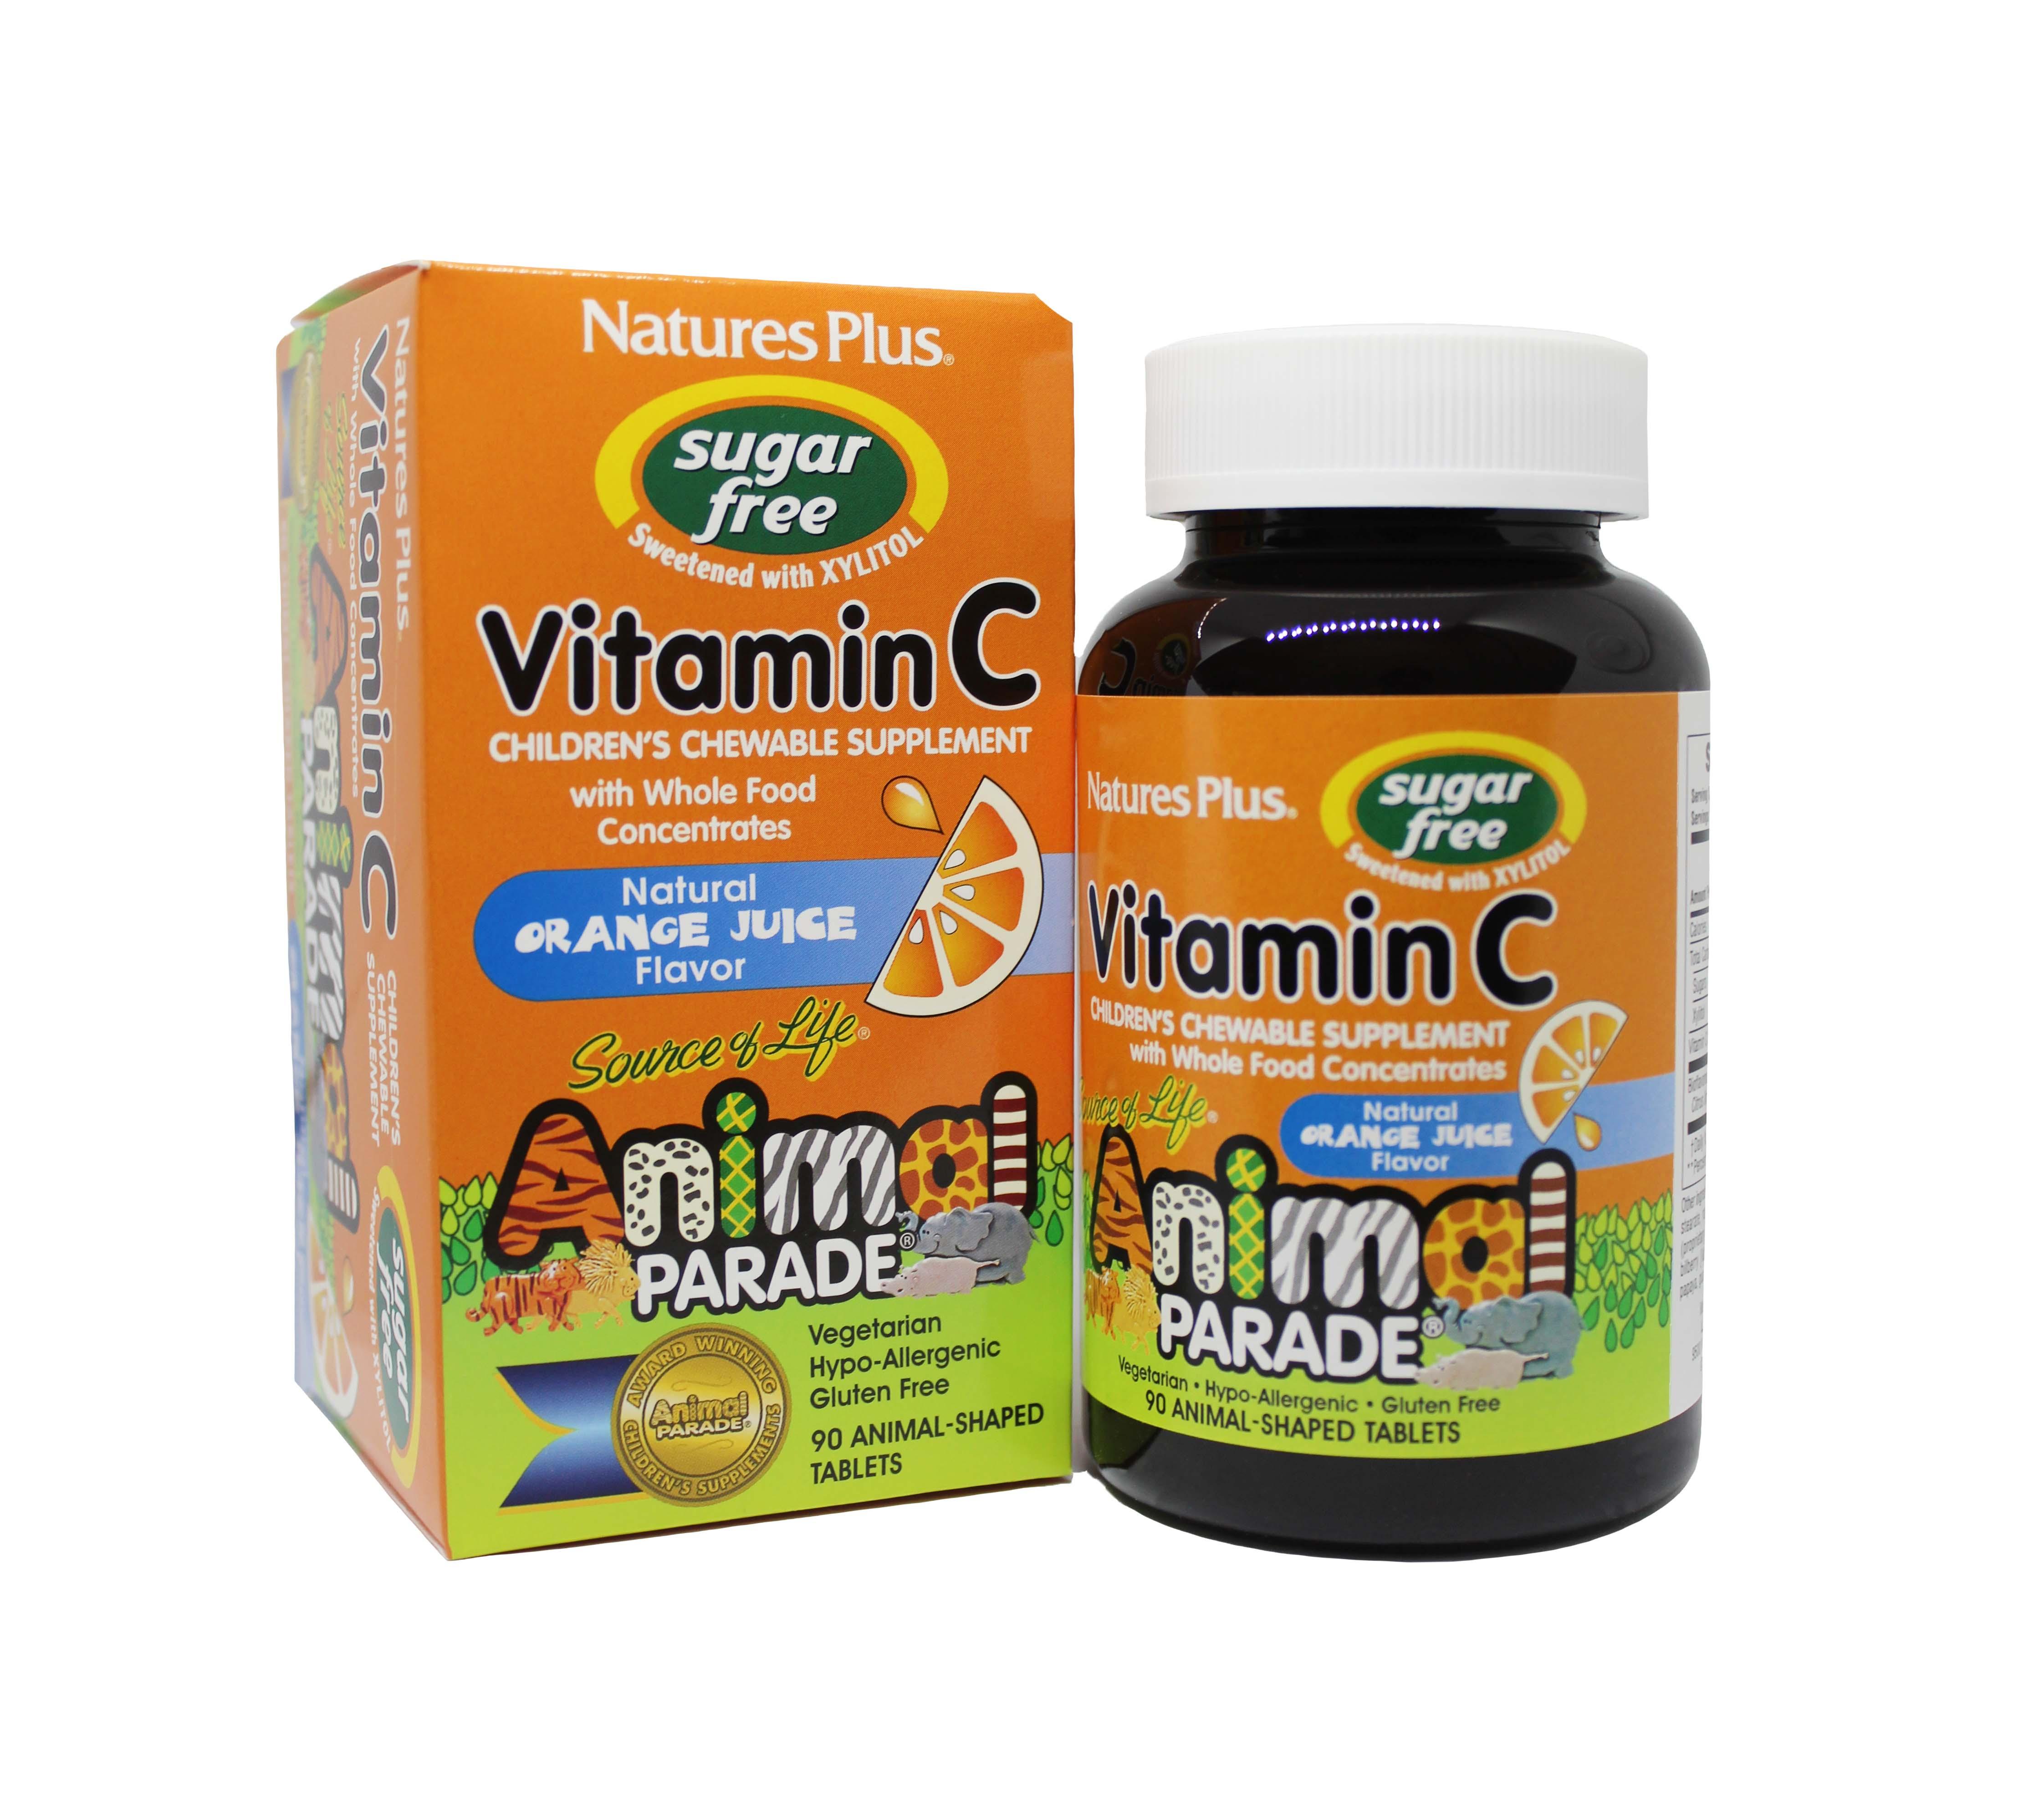 картинки с витамина плюс момента своего образования